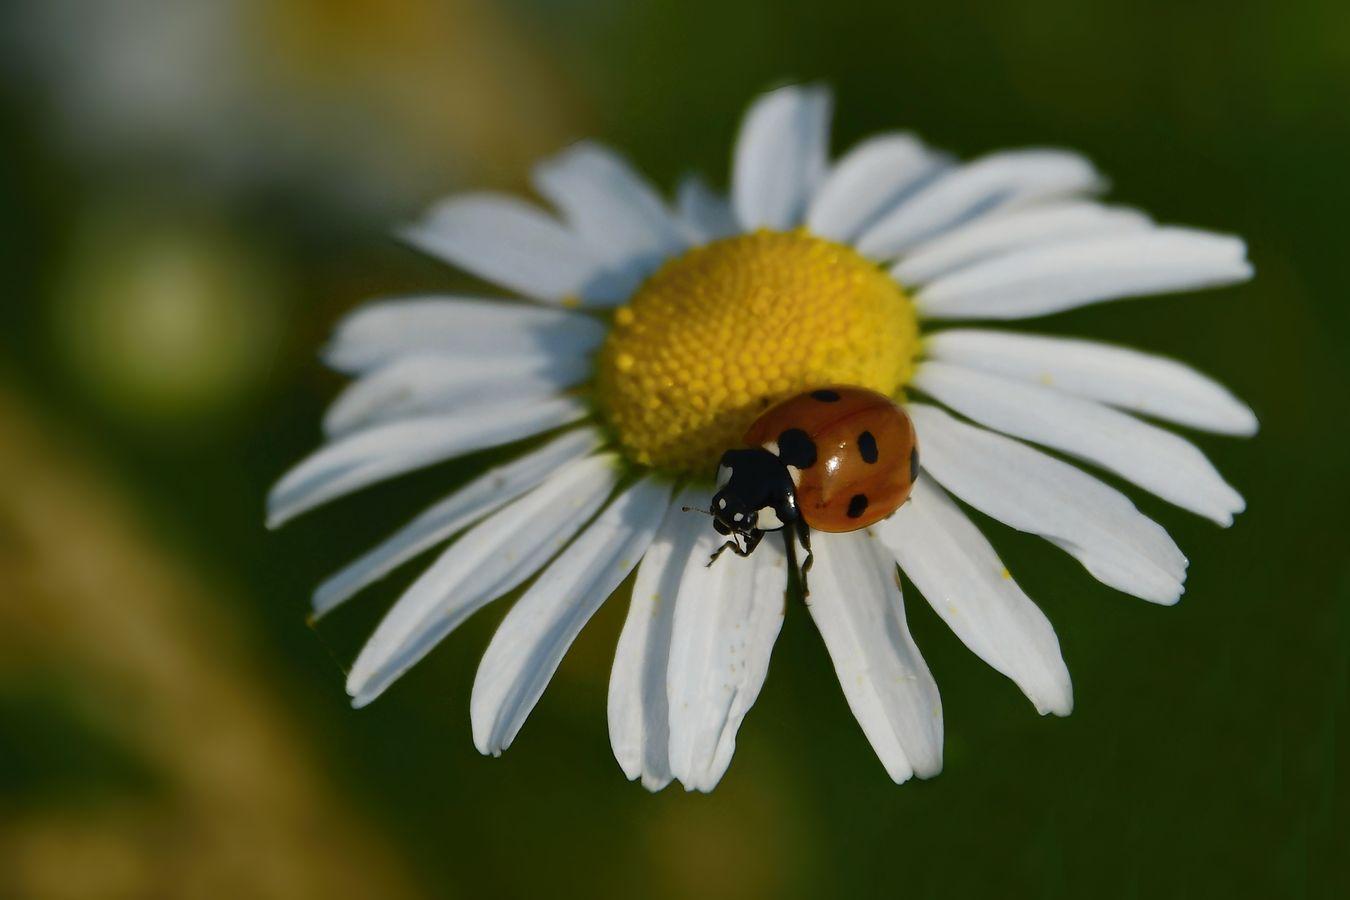 Bedrunka na květu